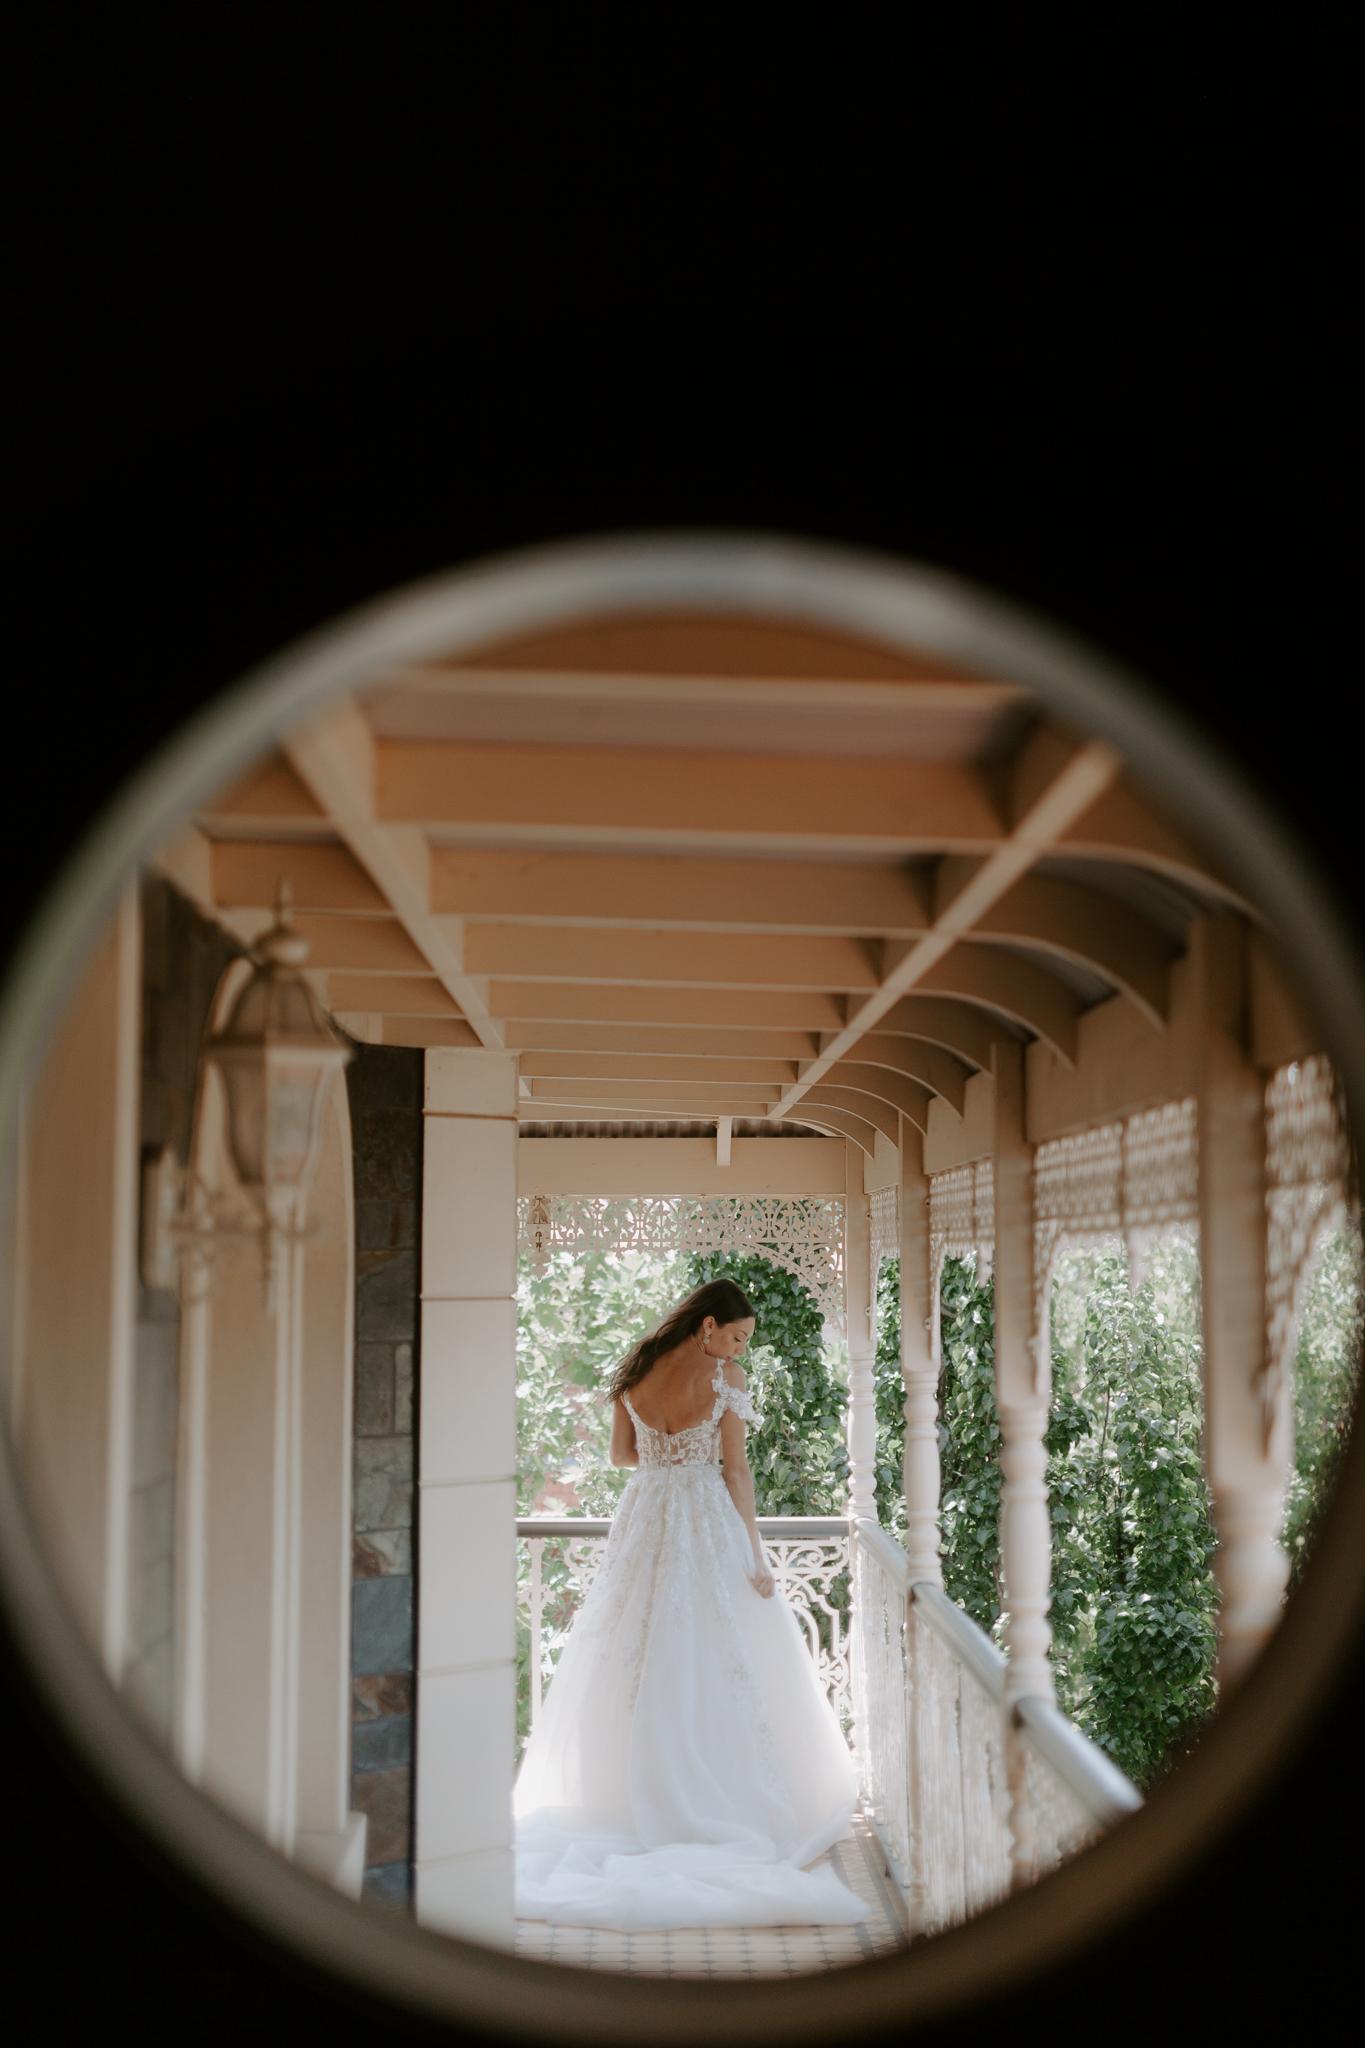 The-Stones-of-Yarra-Valley-Wedding-EmotionsandMathPhotography-029.jpg